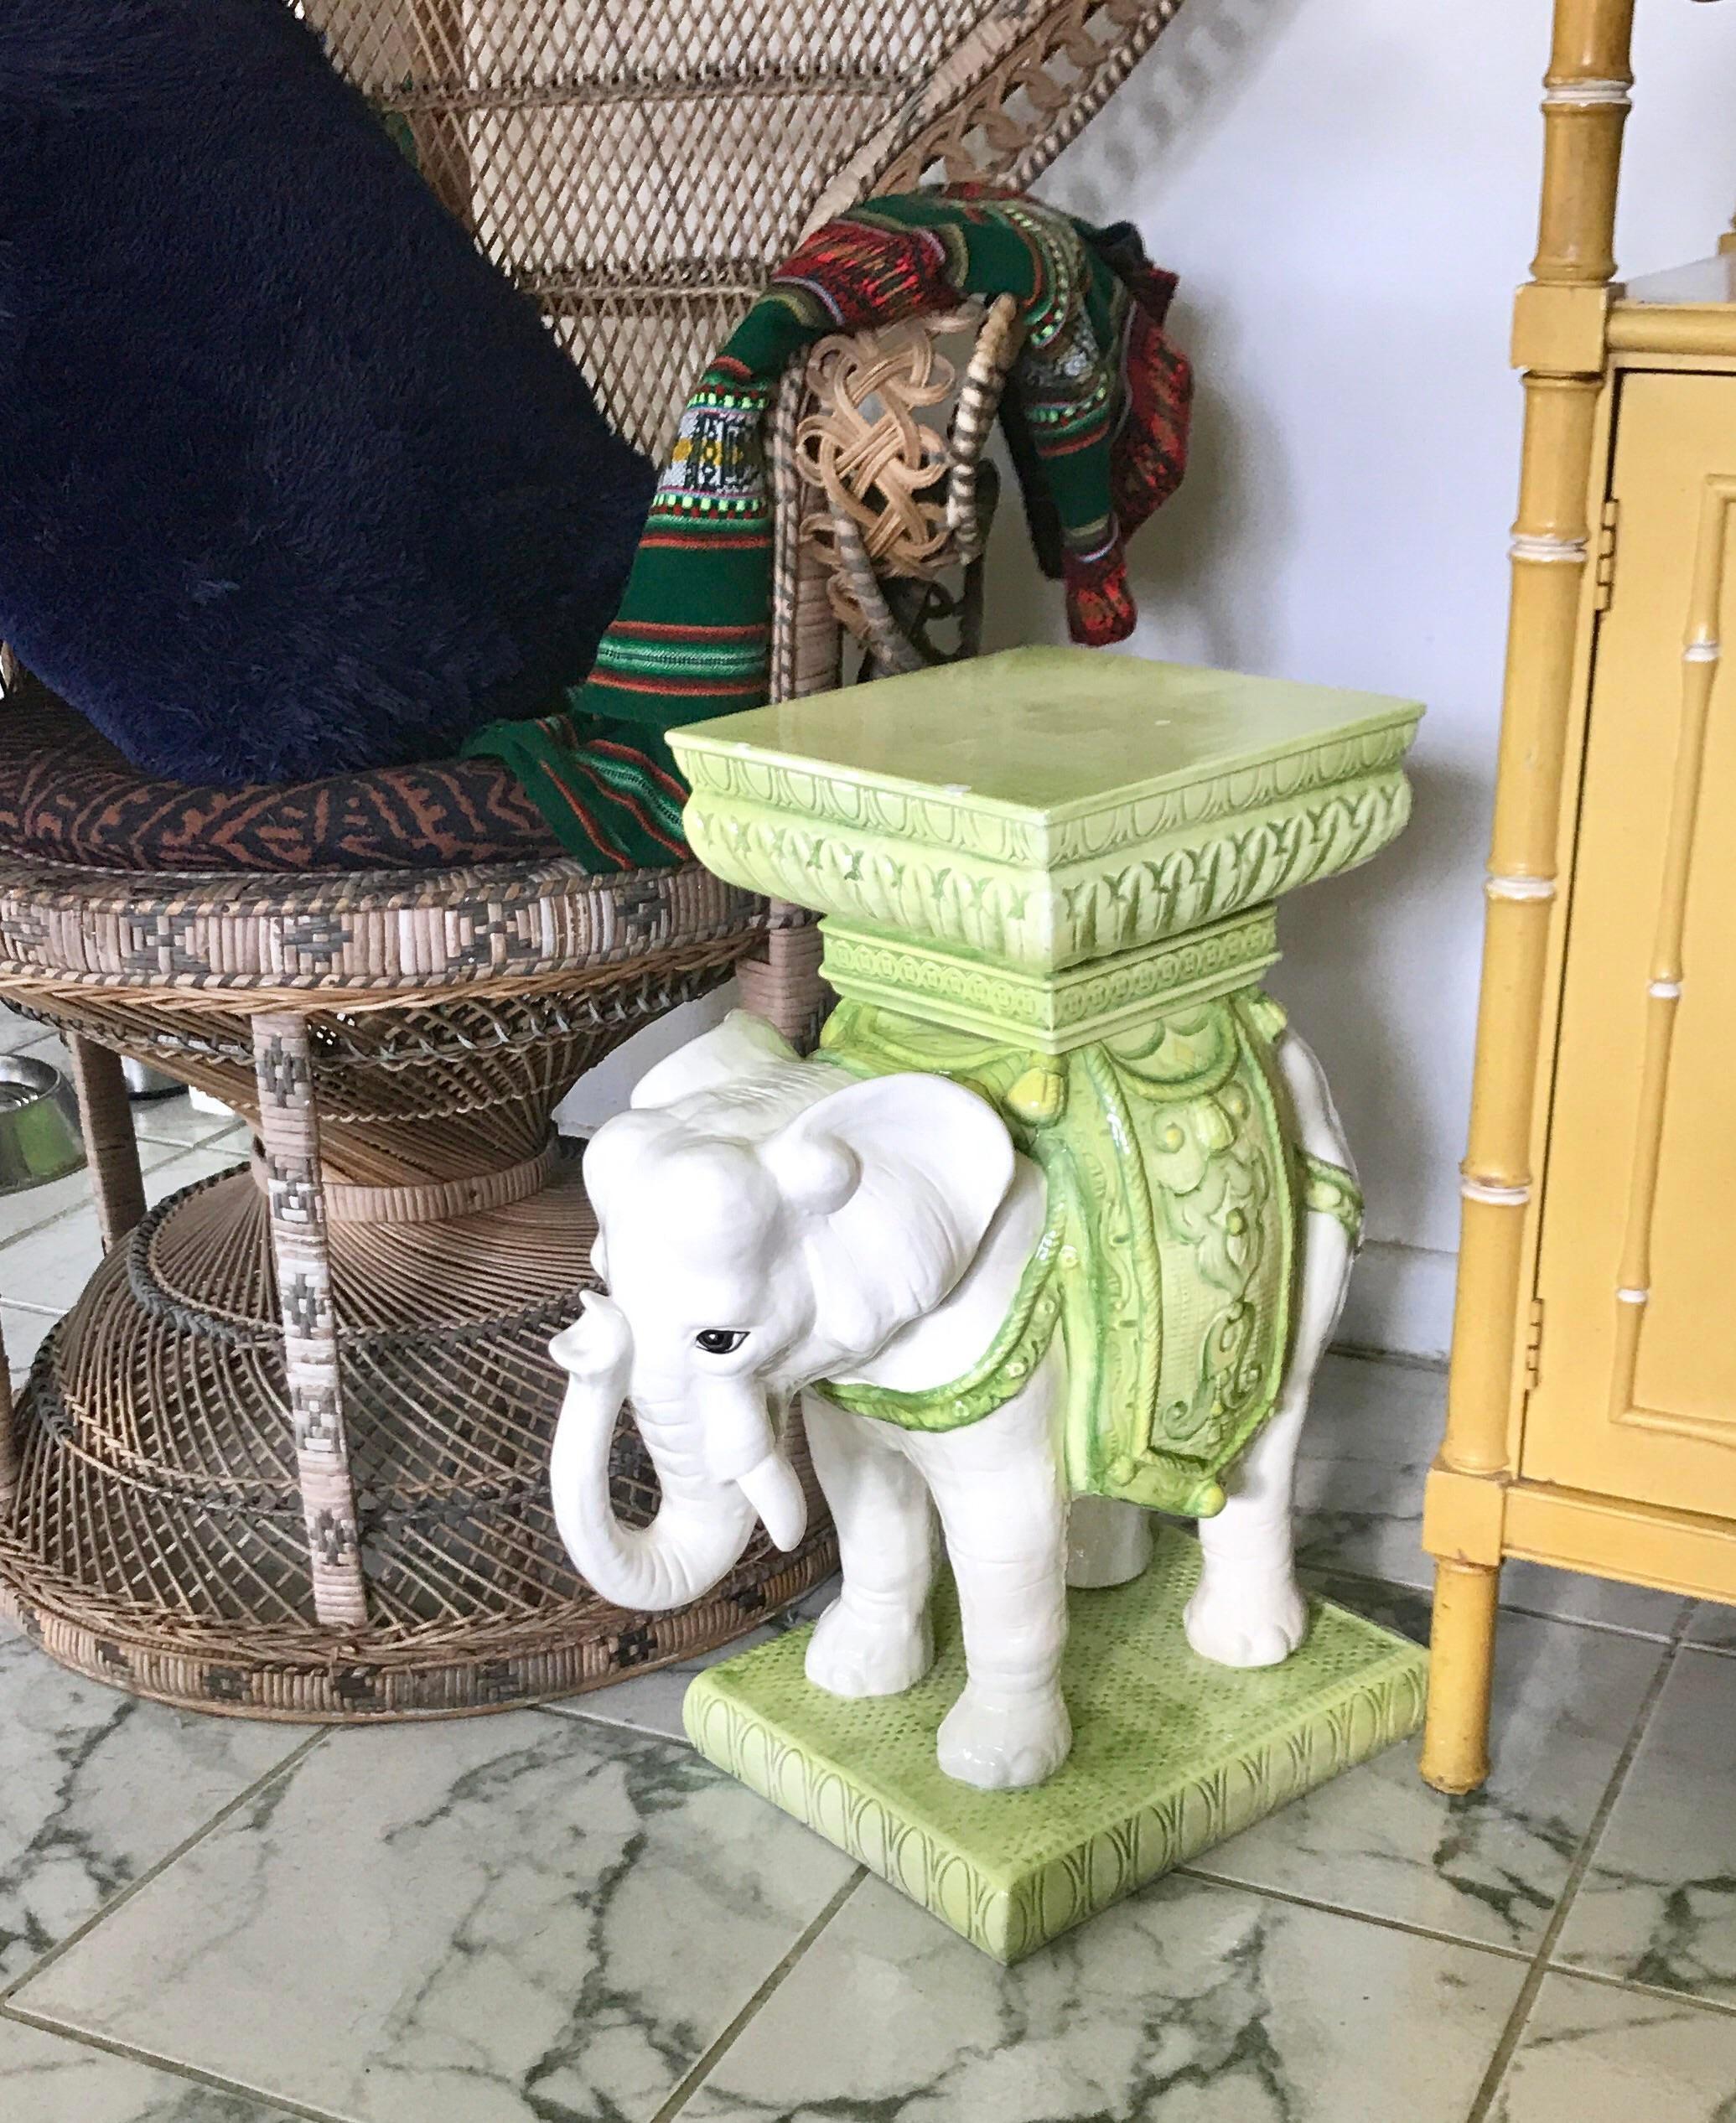 Vintage Bohemian Moroccan Style White And Green Glazed Ceramic Elephant  Garden Stool   Image 7